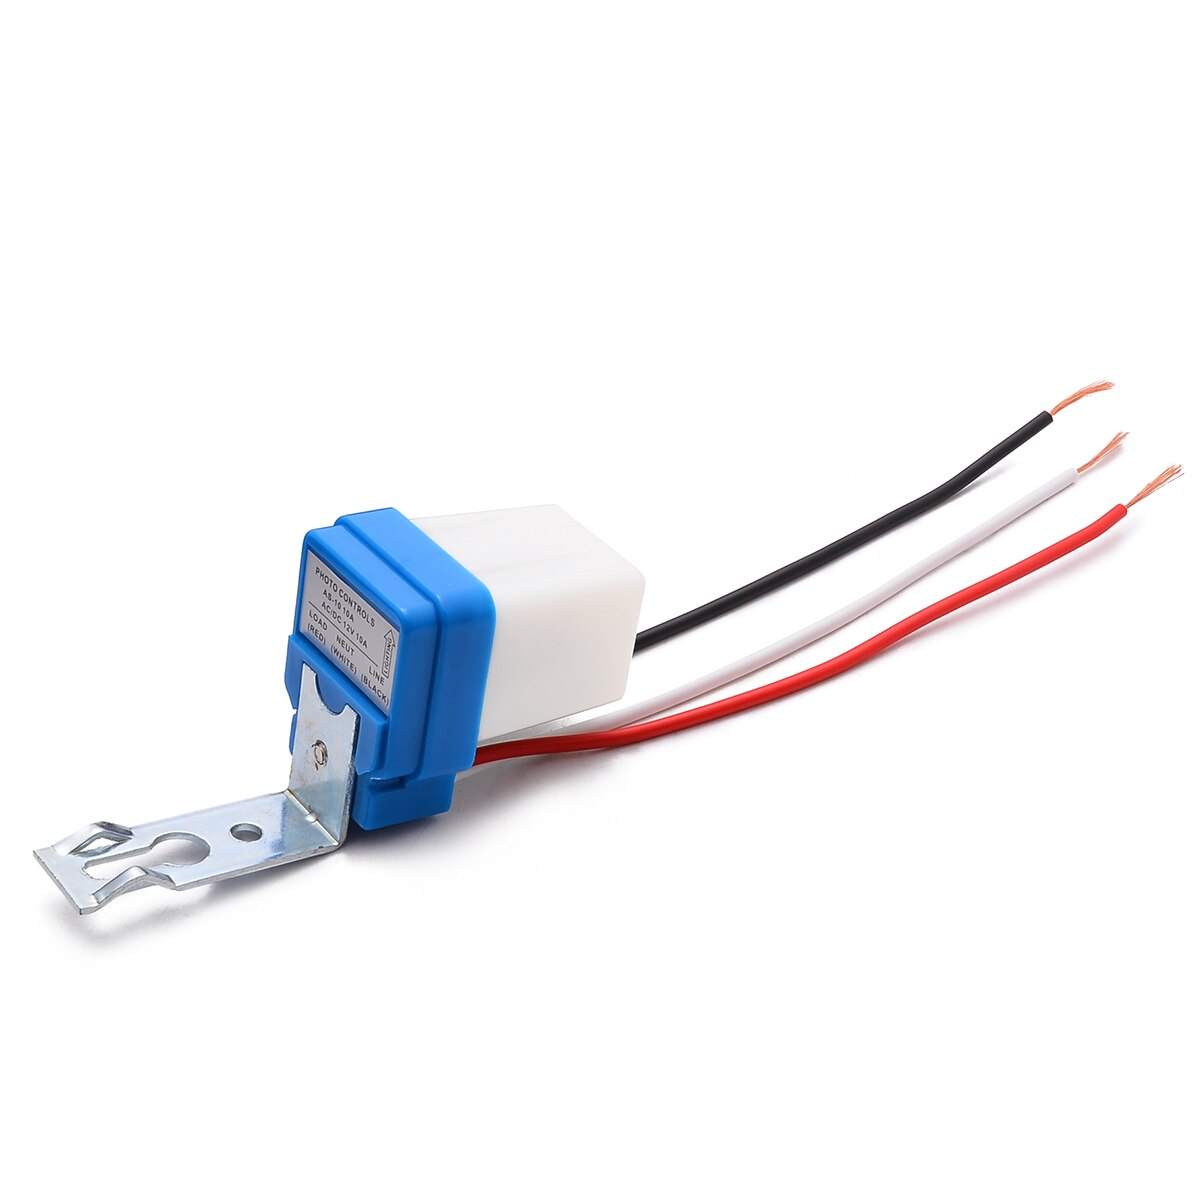 Mini Interruptor de Sensor crepúsculo atardecer 12V 10A luz de noche para exterior interruptor de Sensor para lámpara led Interruptor de Sensor